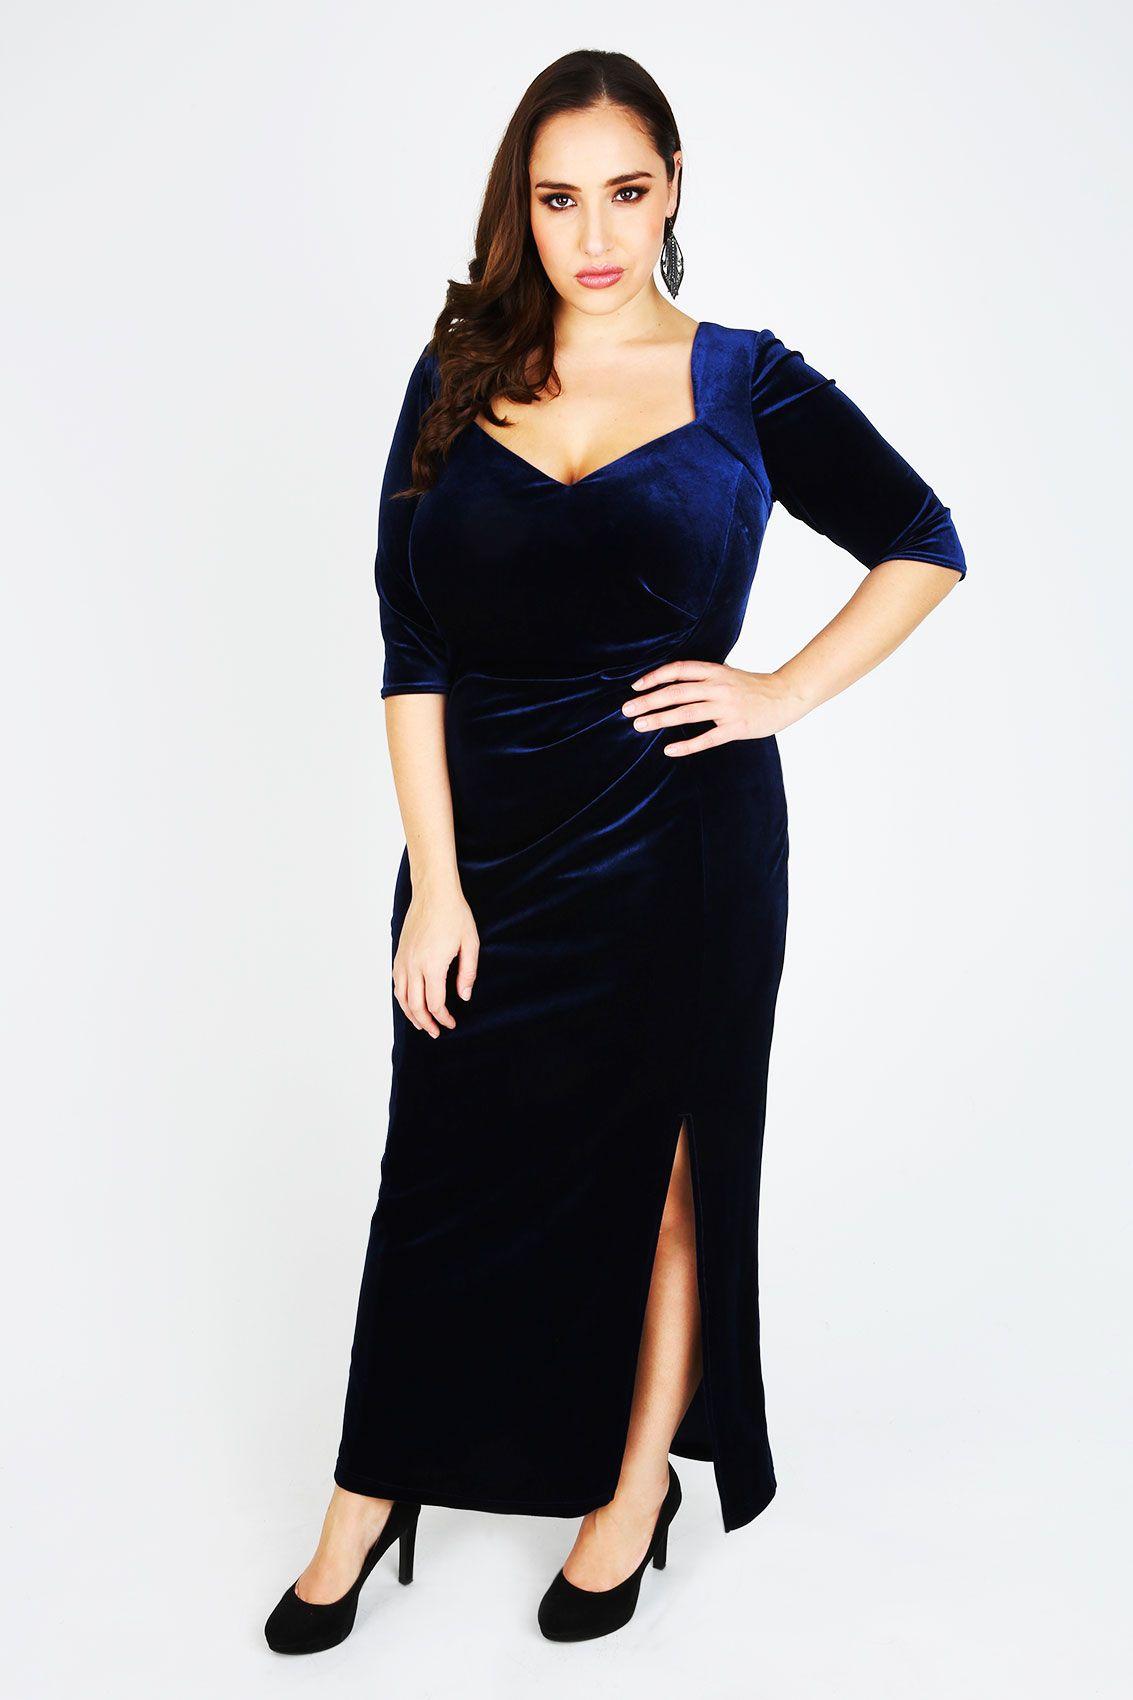 6de7d051a5ace SCARLETT & JO Midnight Blue Velvet Maxi Dress | Jada Sezer (Yours ...